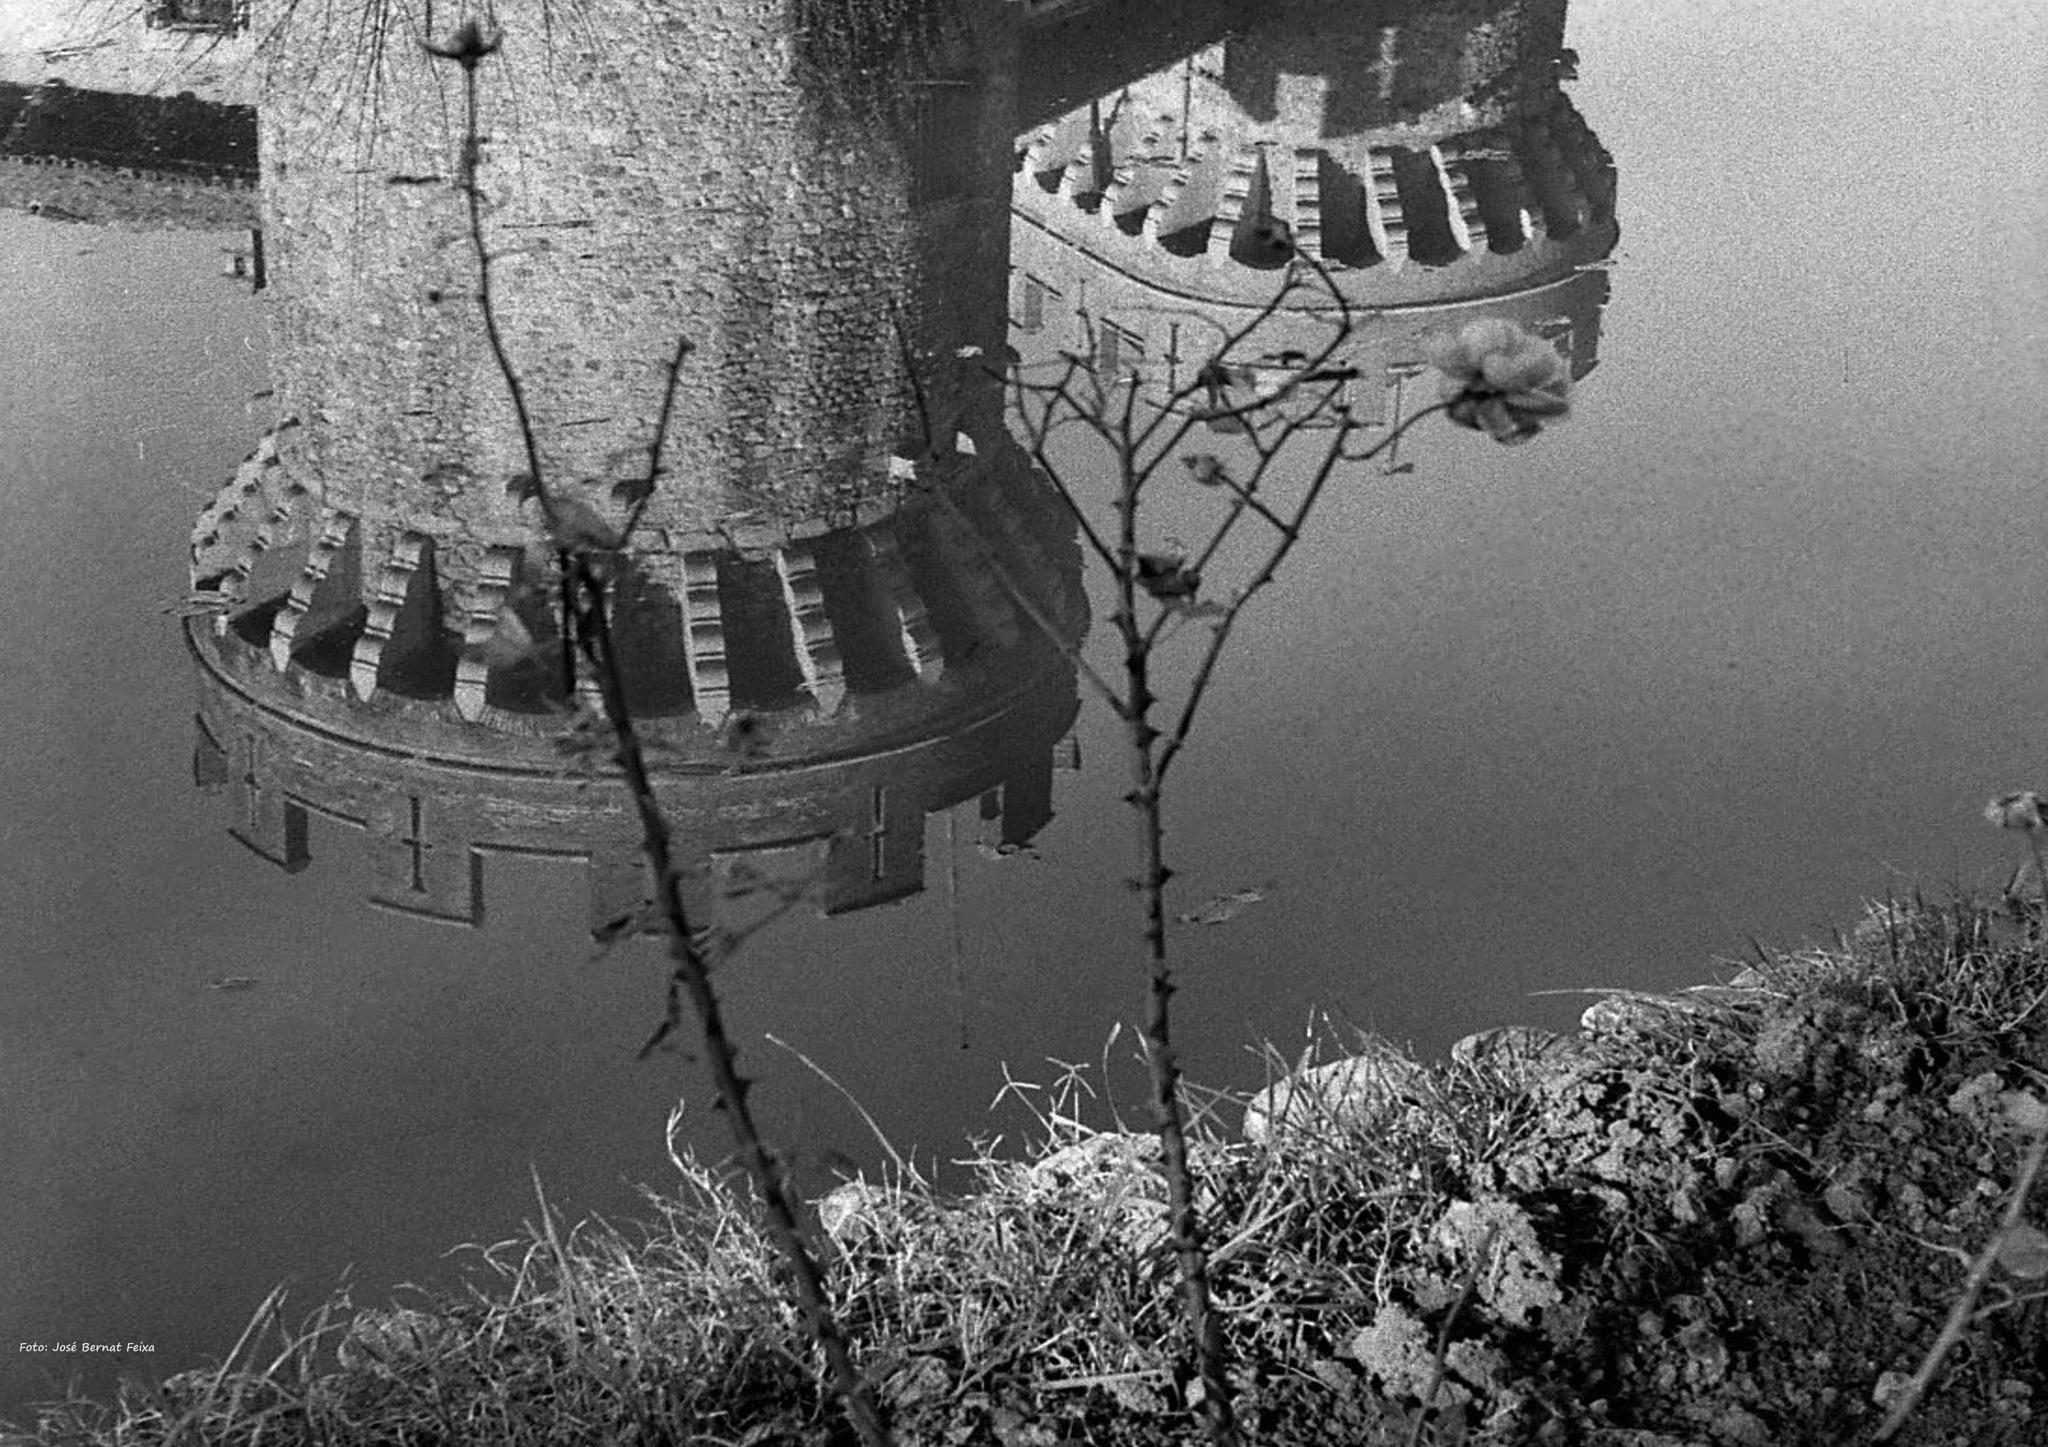 TORRES REFLEJADAS; WEERSPIEGELDE TORENS; REFLECTED TOWERS (60's) by José Bernat Feixa